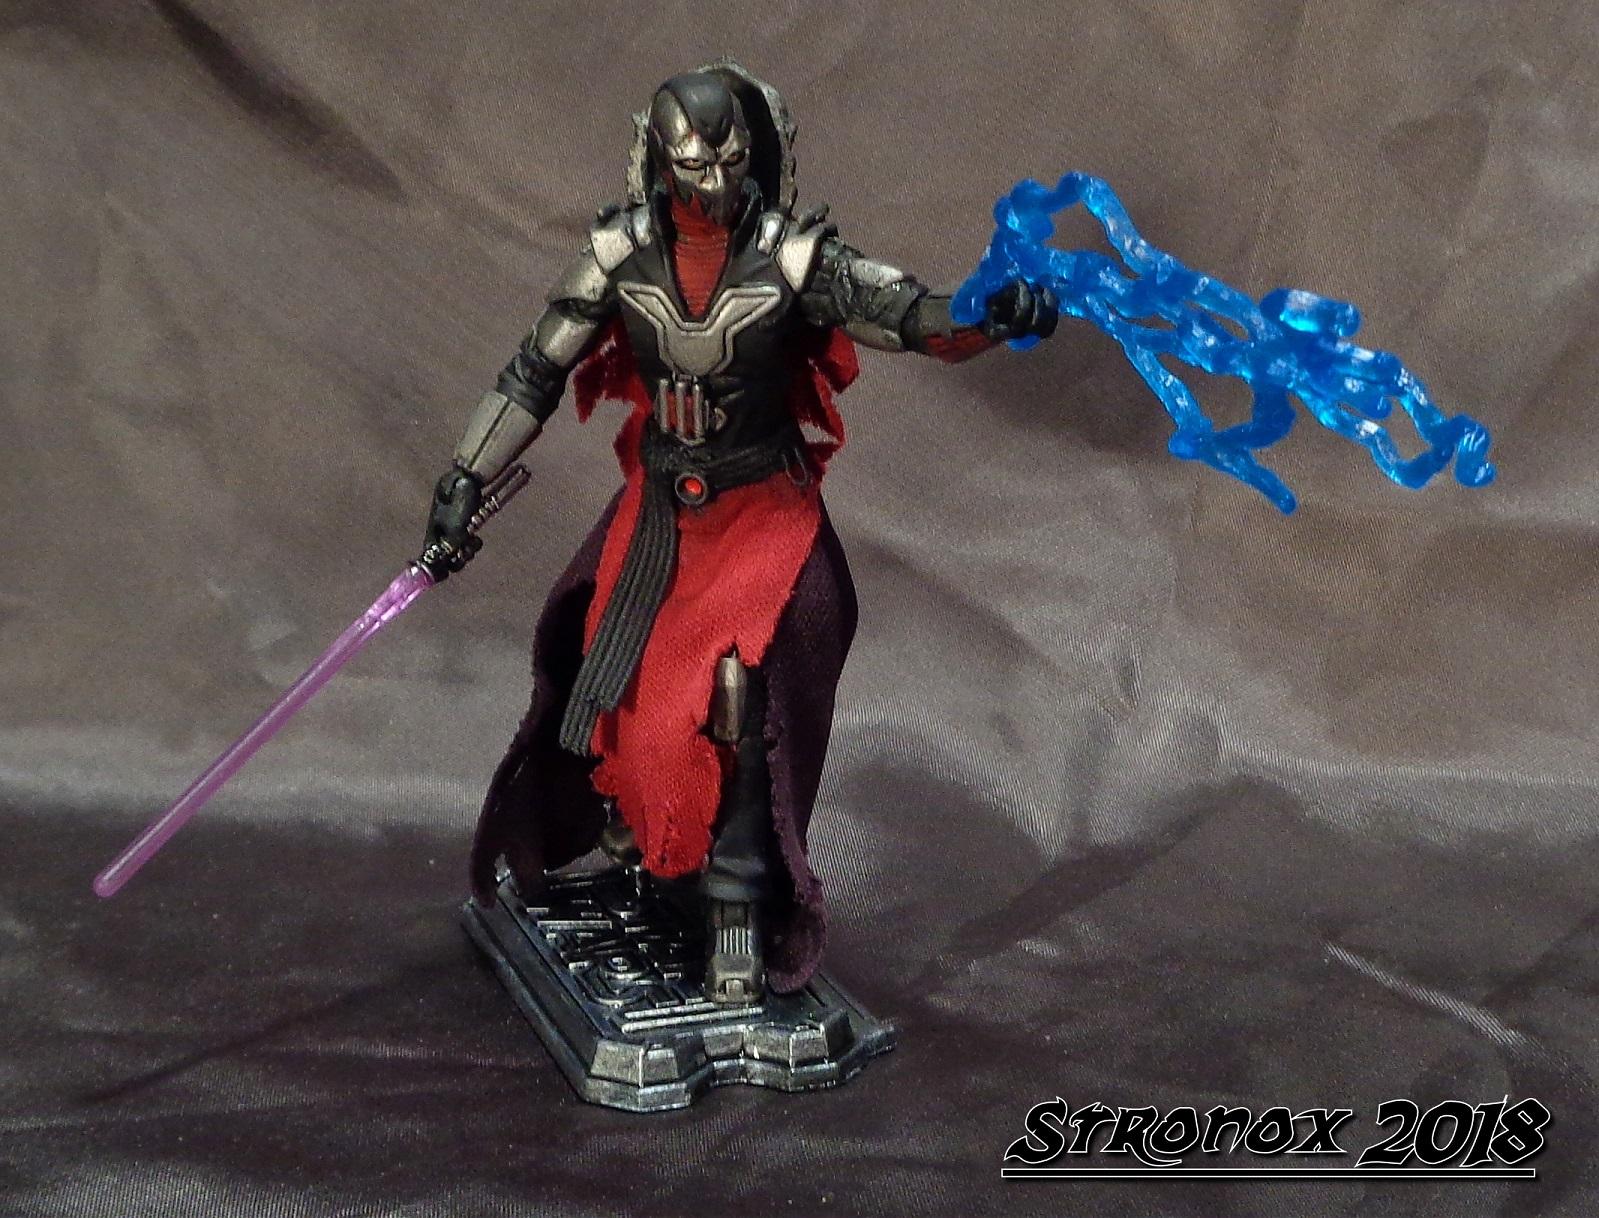 Stronox Custom Figures: Star Wars: Old Republic Sith Lord